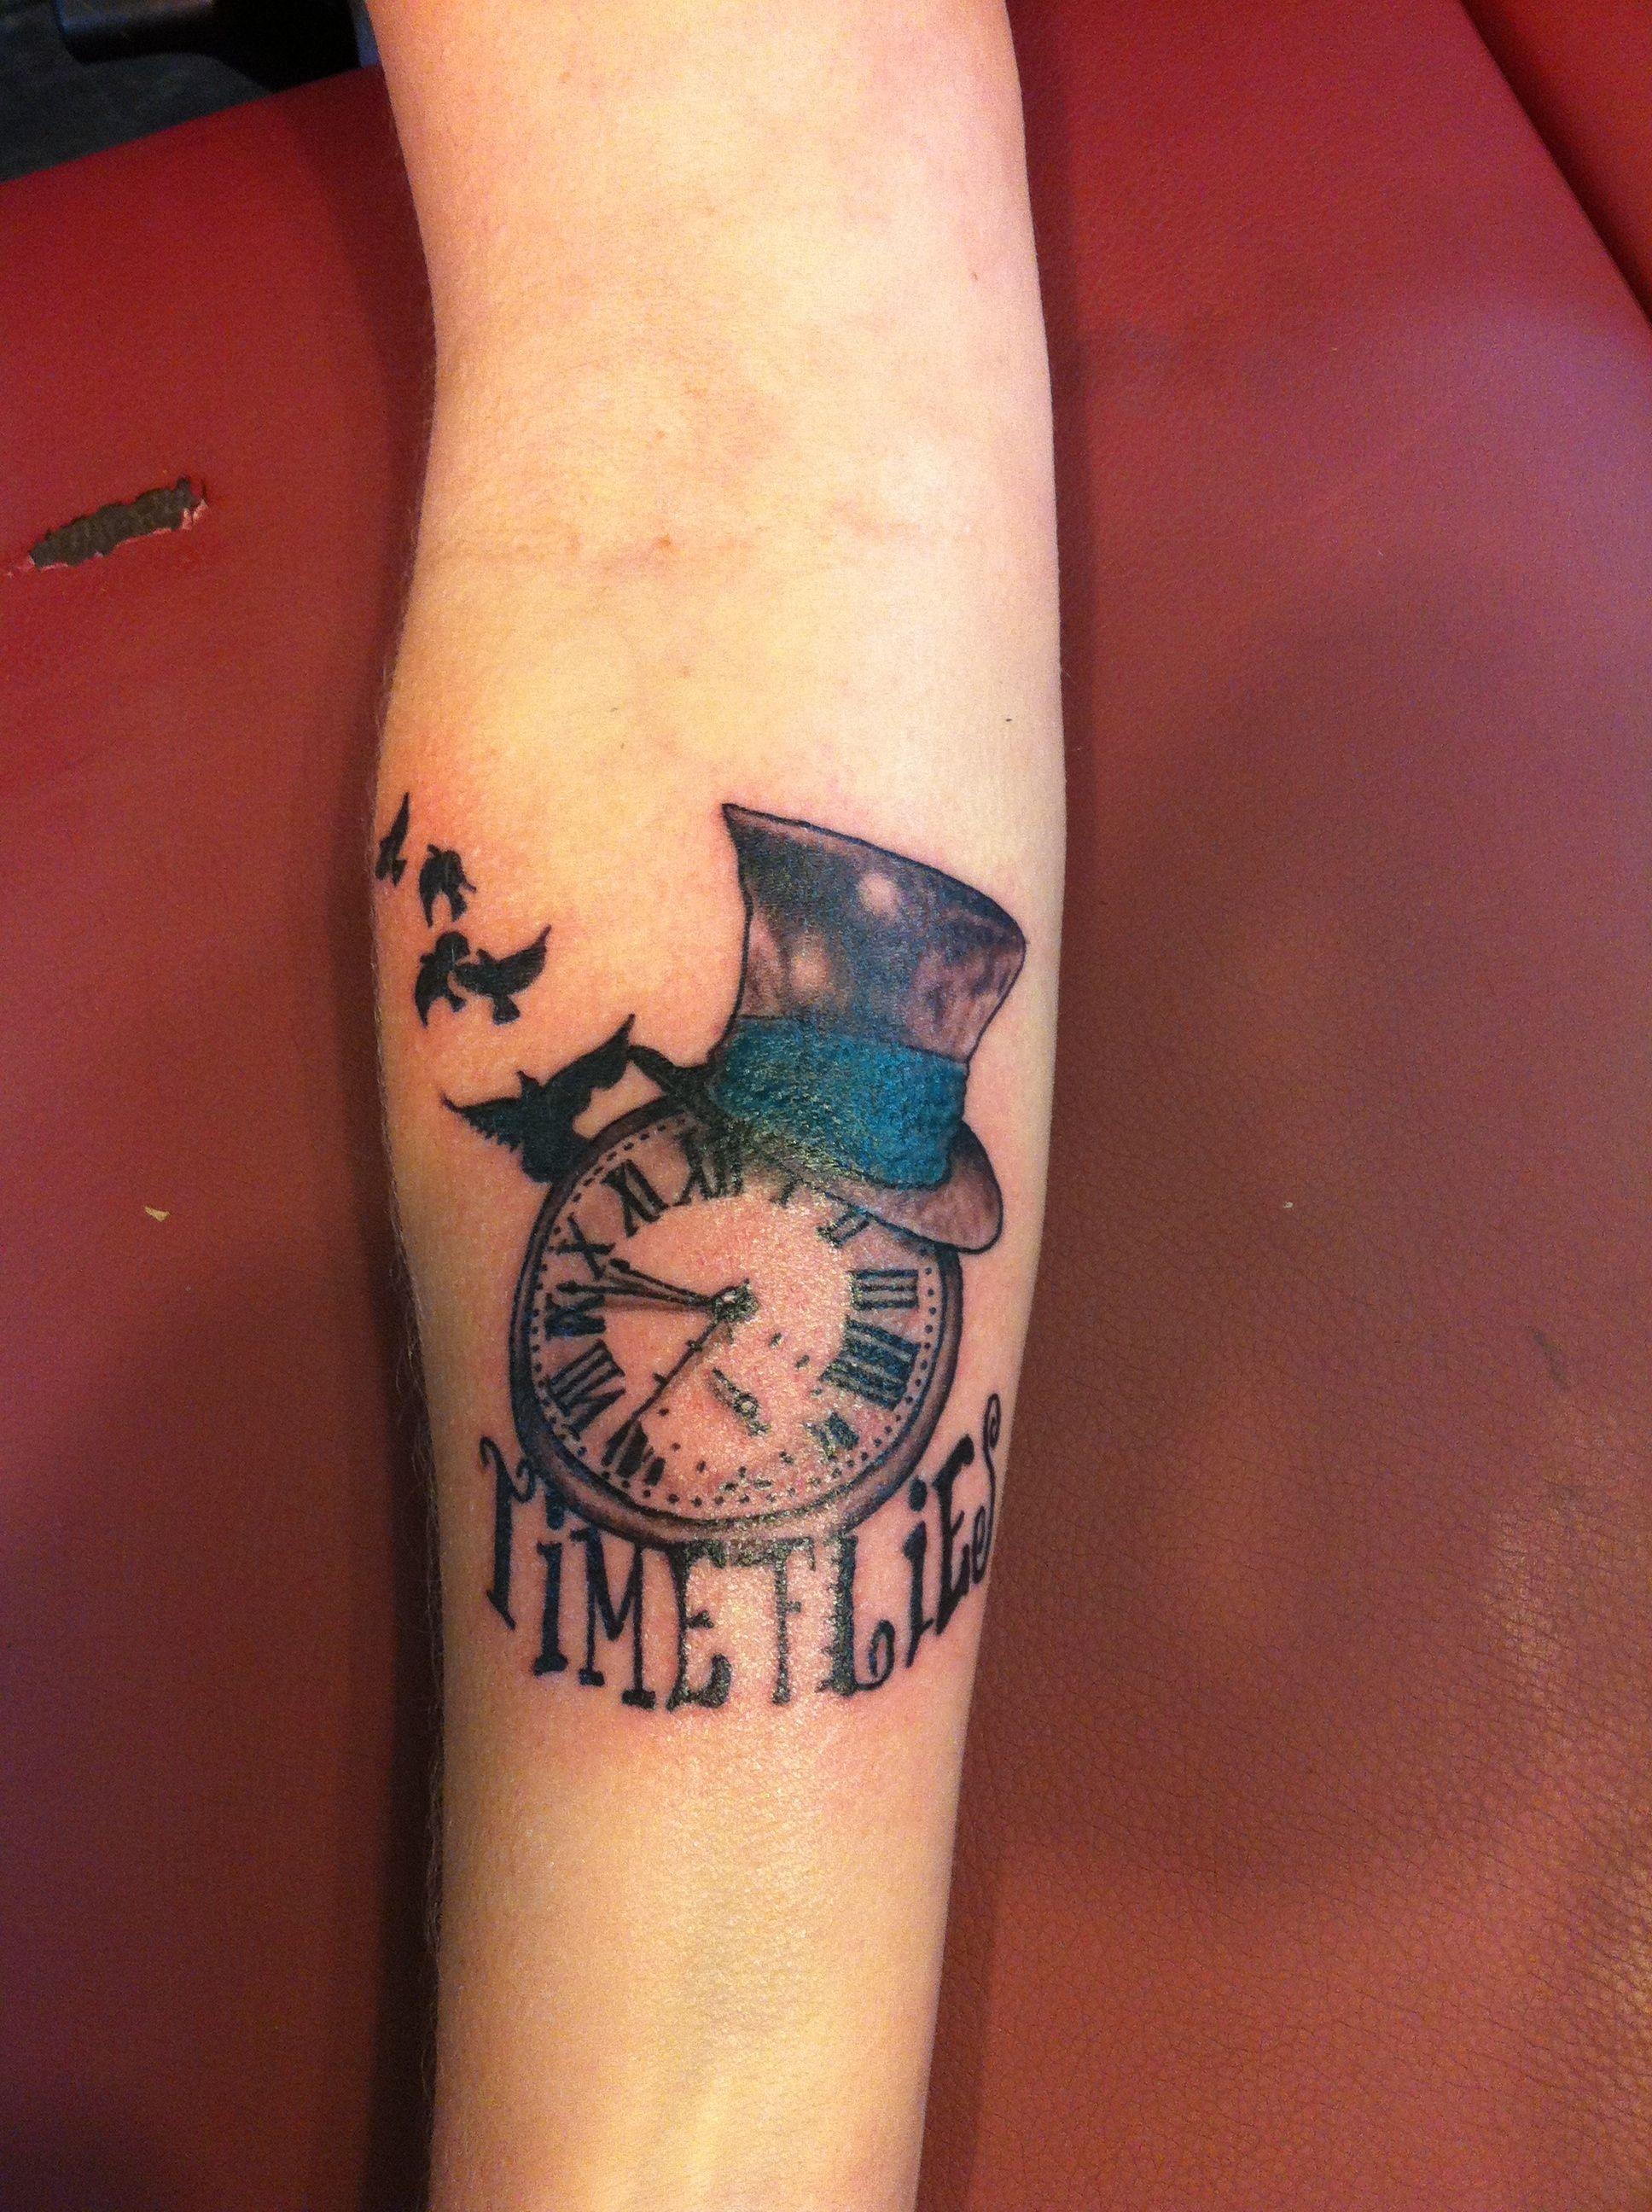 Pin By Lorraine Moore On My Tattoos Time Flies Tattoo Clock Tattoo Design Cool Tattoos